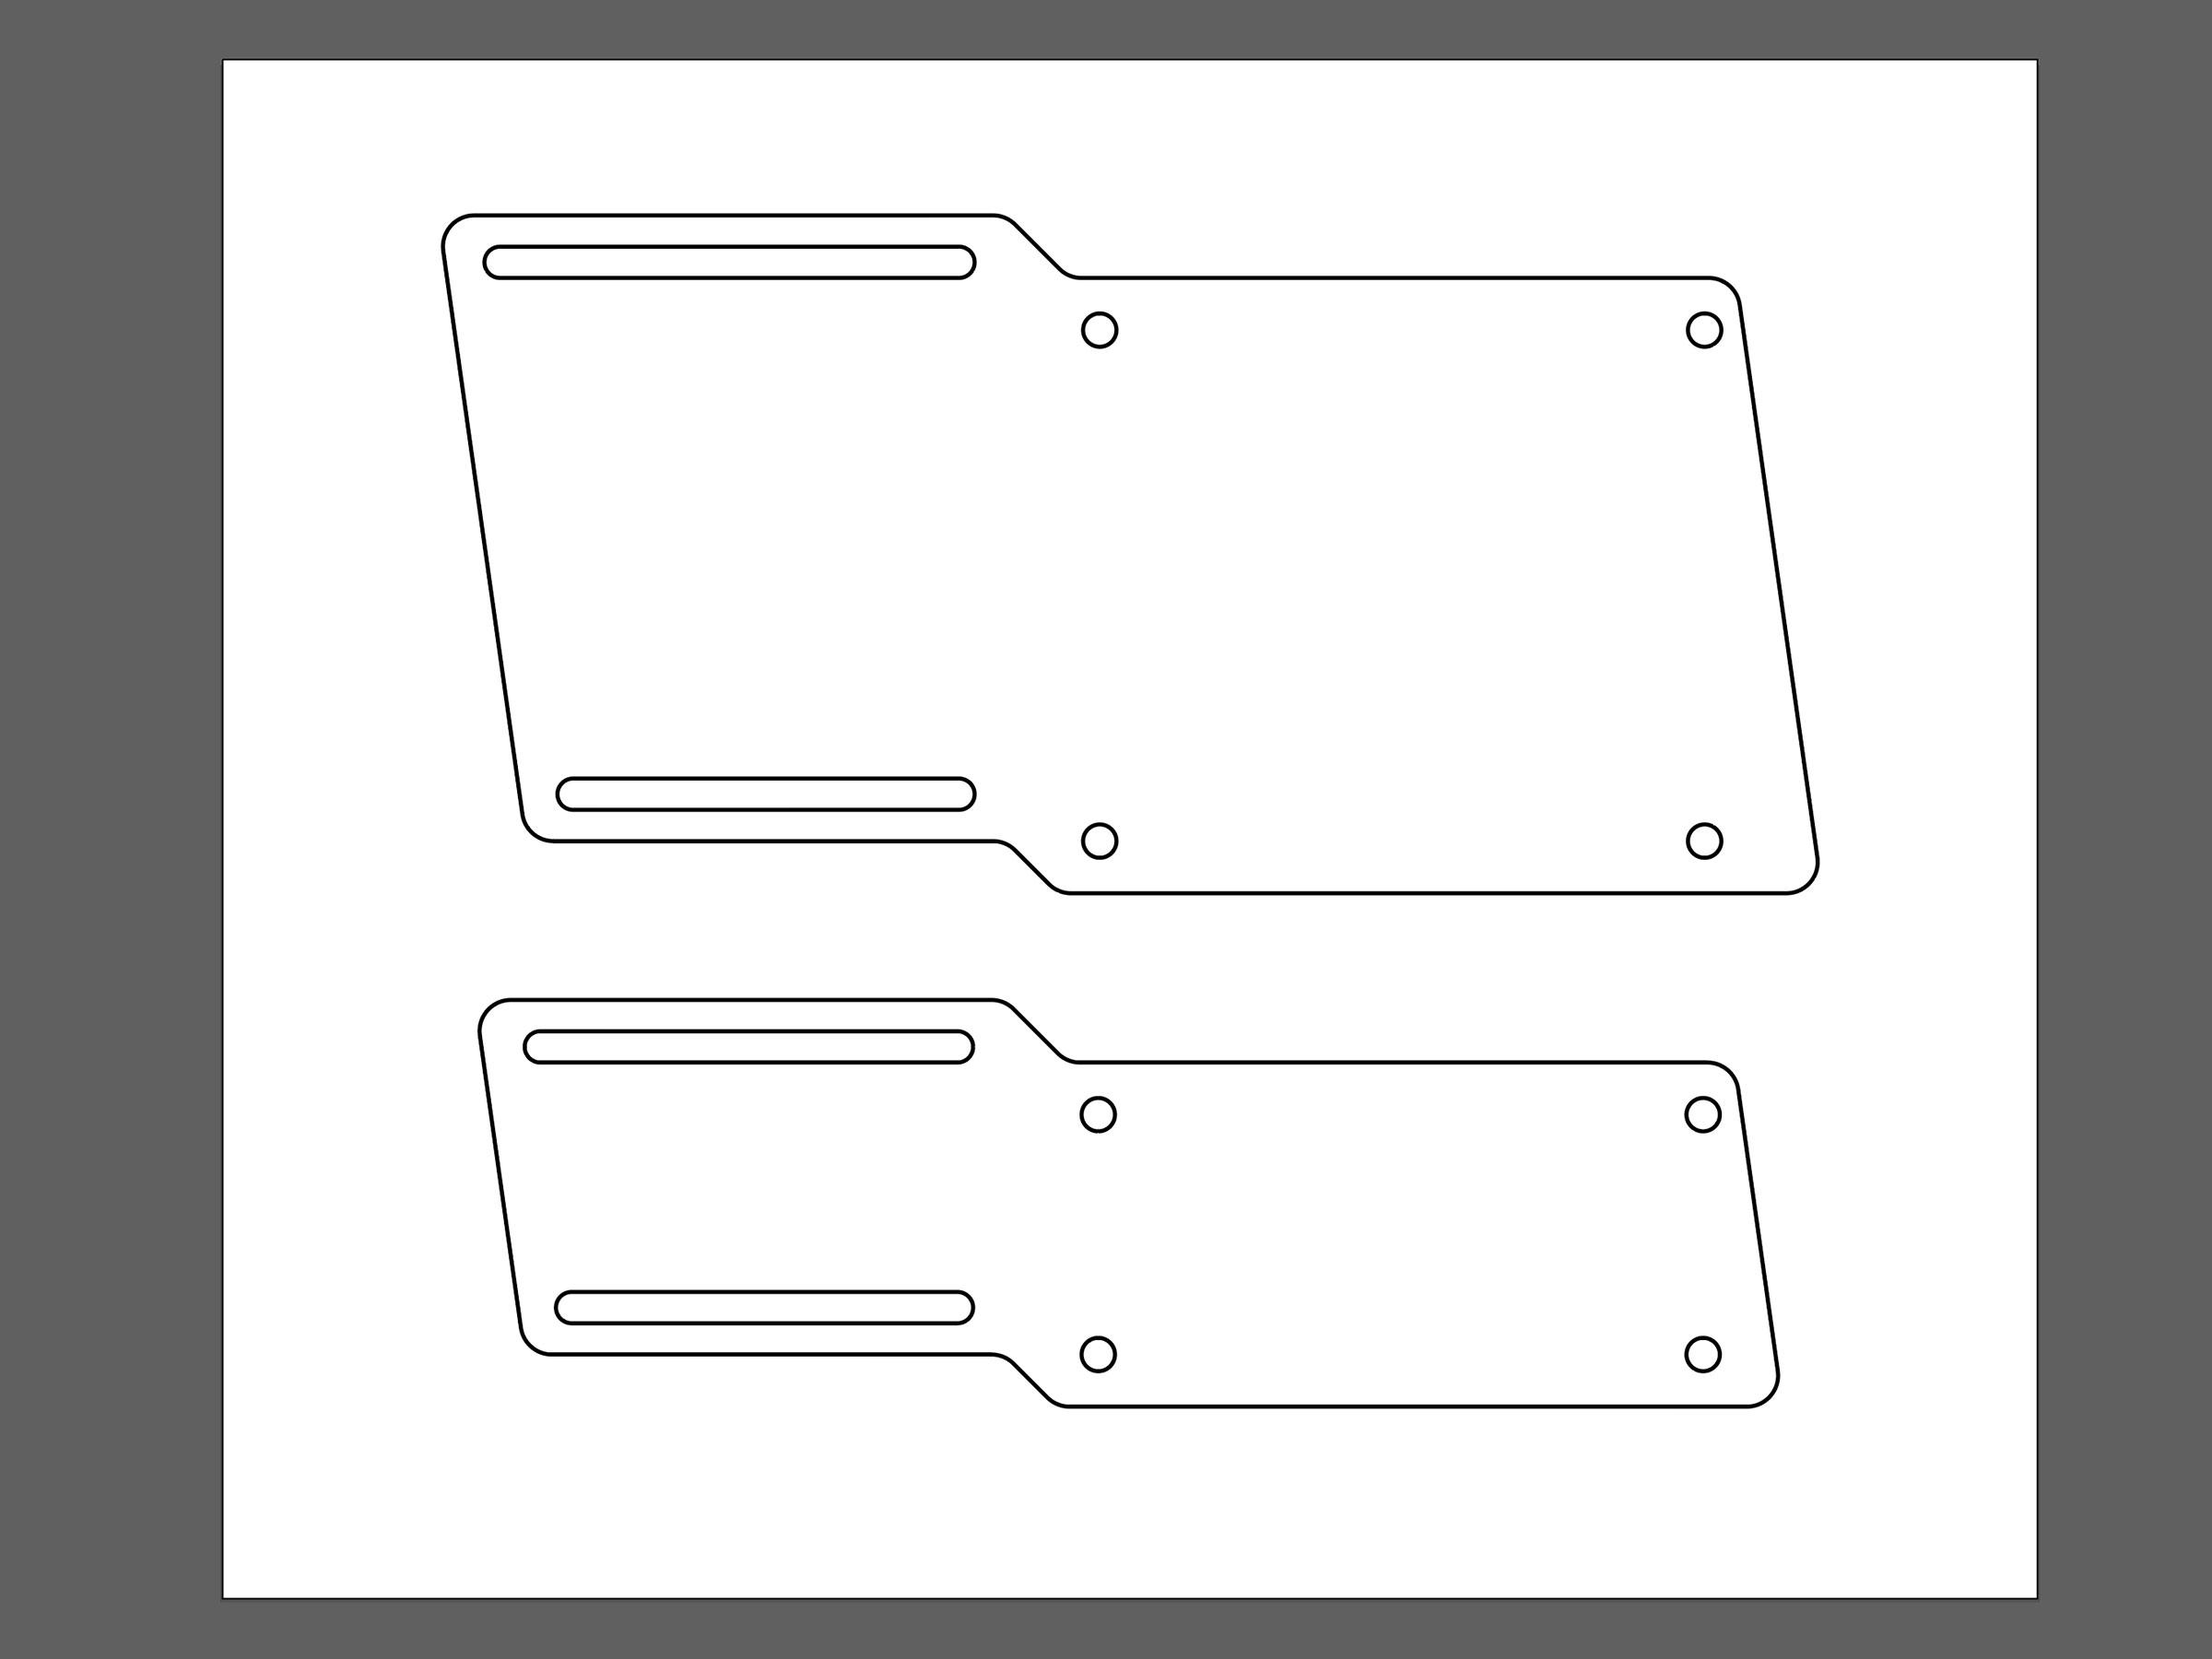 3d_printing_vectors.jpg